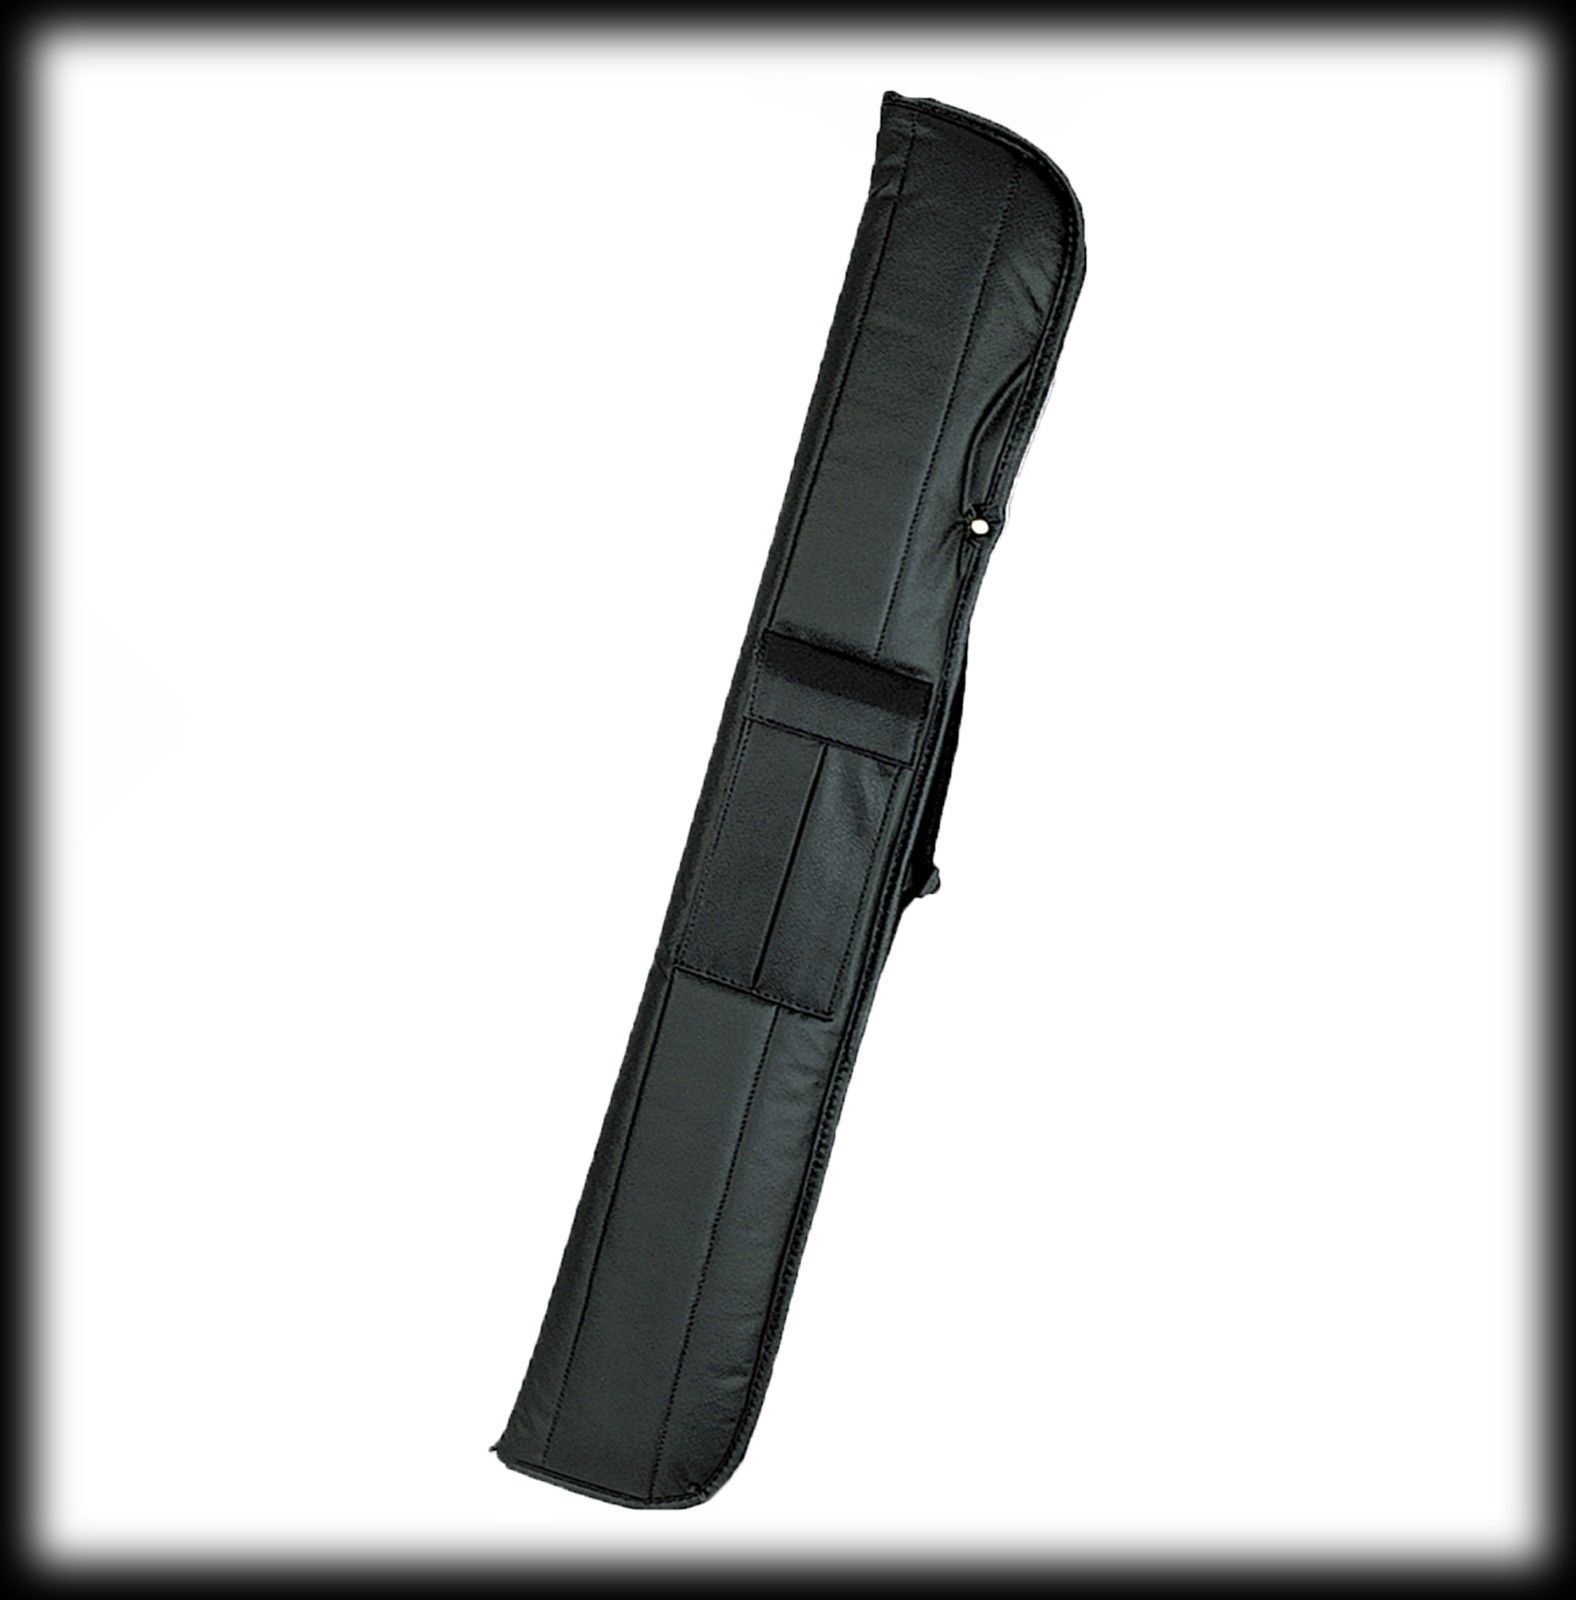 New Elite ELBJZ Break/Jump Cue Stick - Zebrawood & Maple 18 - 21 oz & Case